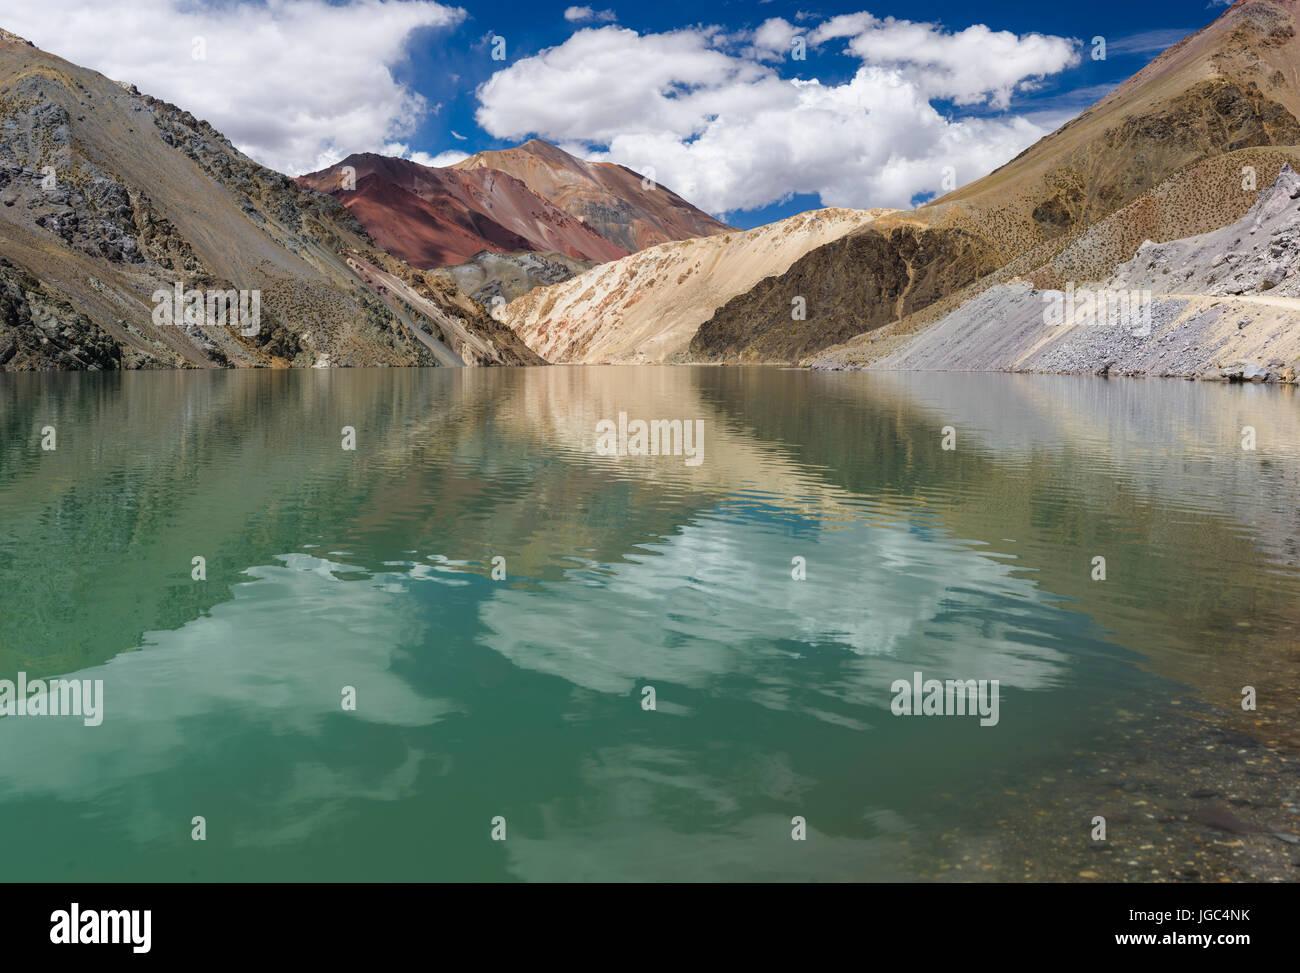 Paso de agua negra, los andes, chile argentina Imagen De Stock